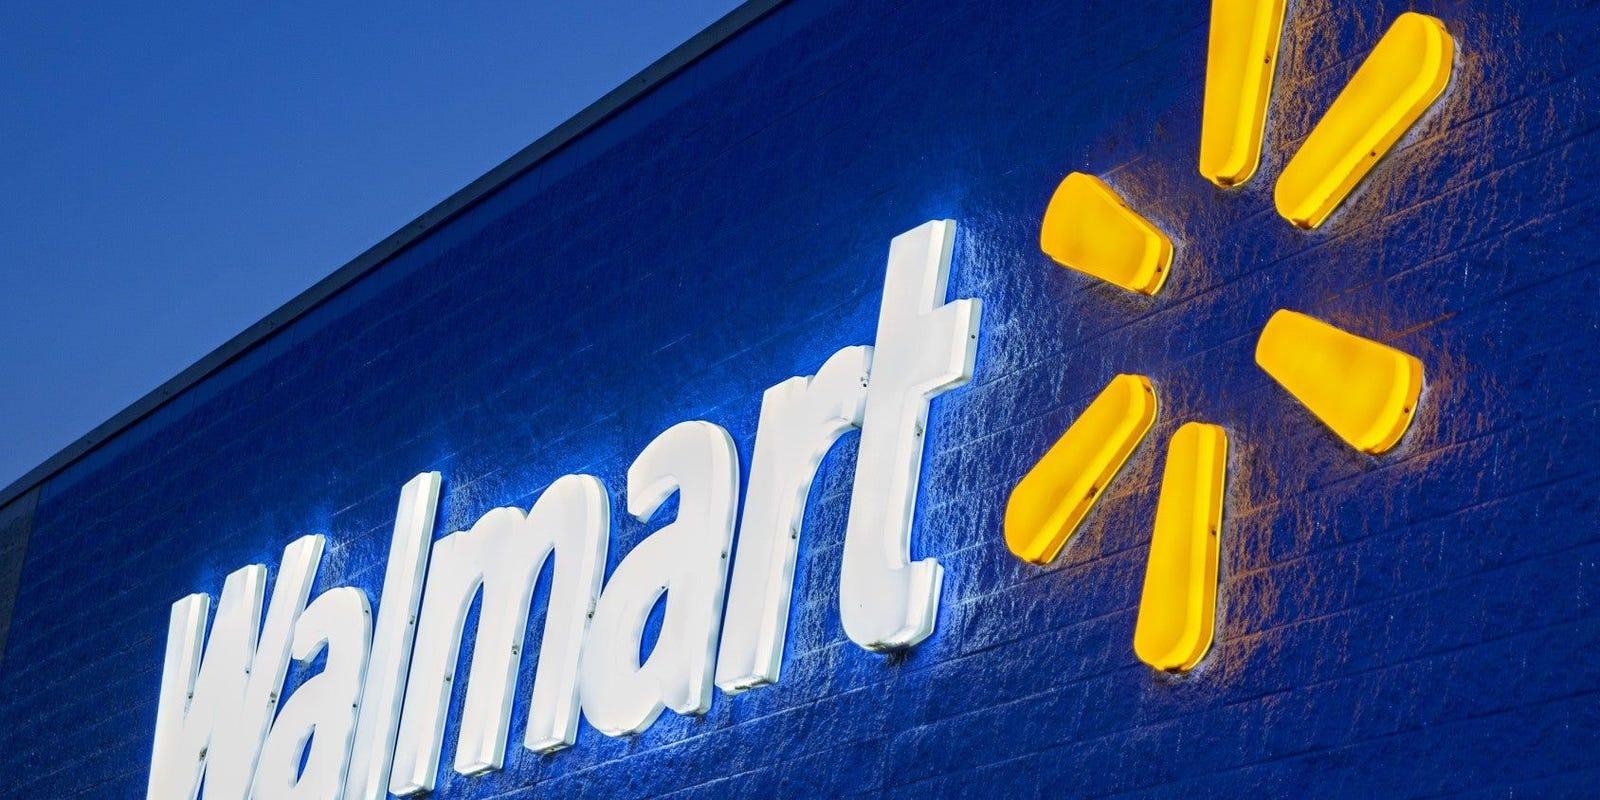 Walmart, Sam's Club to demand customers wear masks